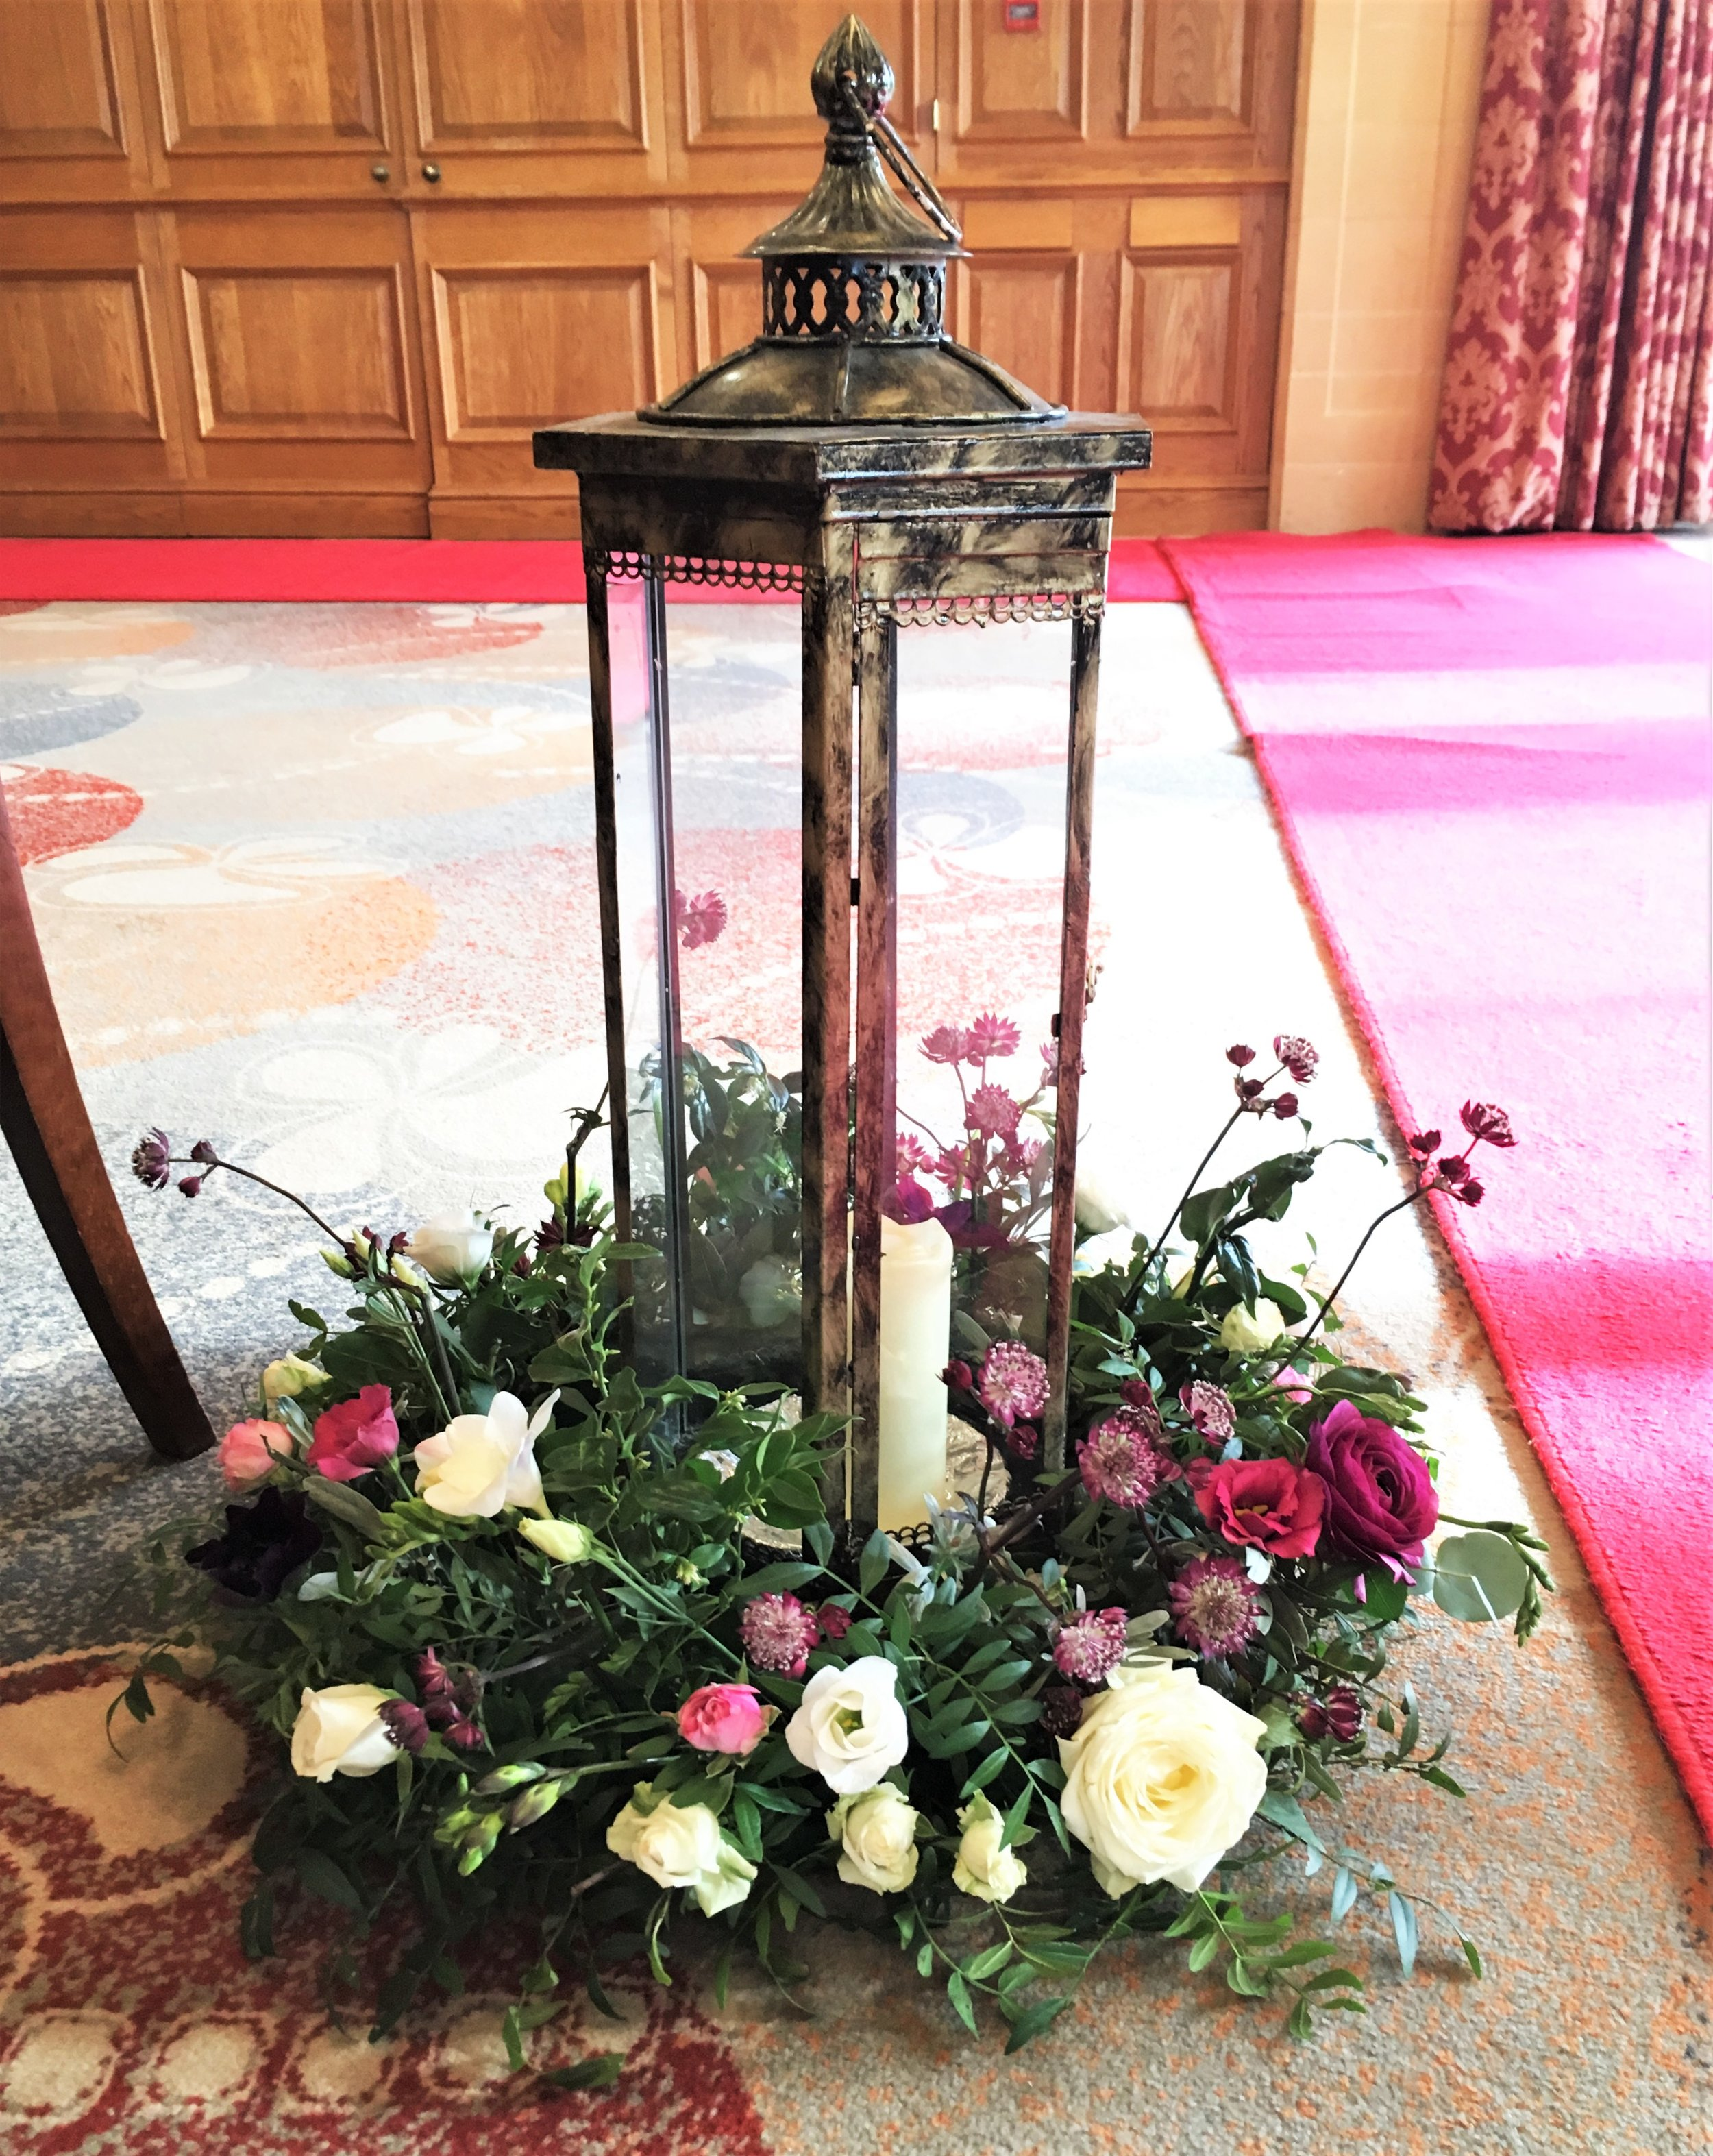 Webb-and-Farrer-Florist-Brighton-Sussex-Wedding-Flowers (19).JPG